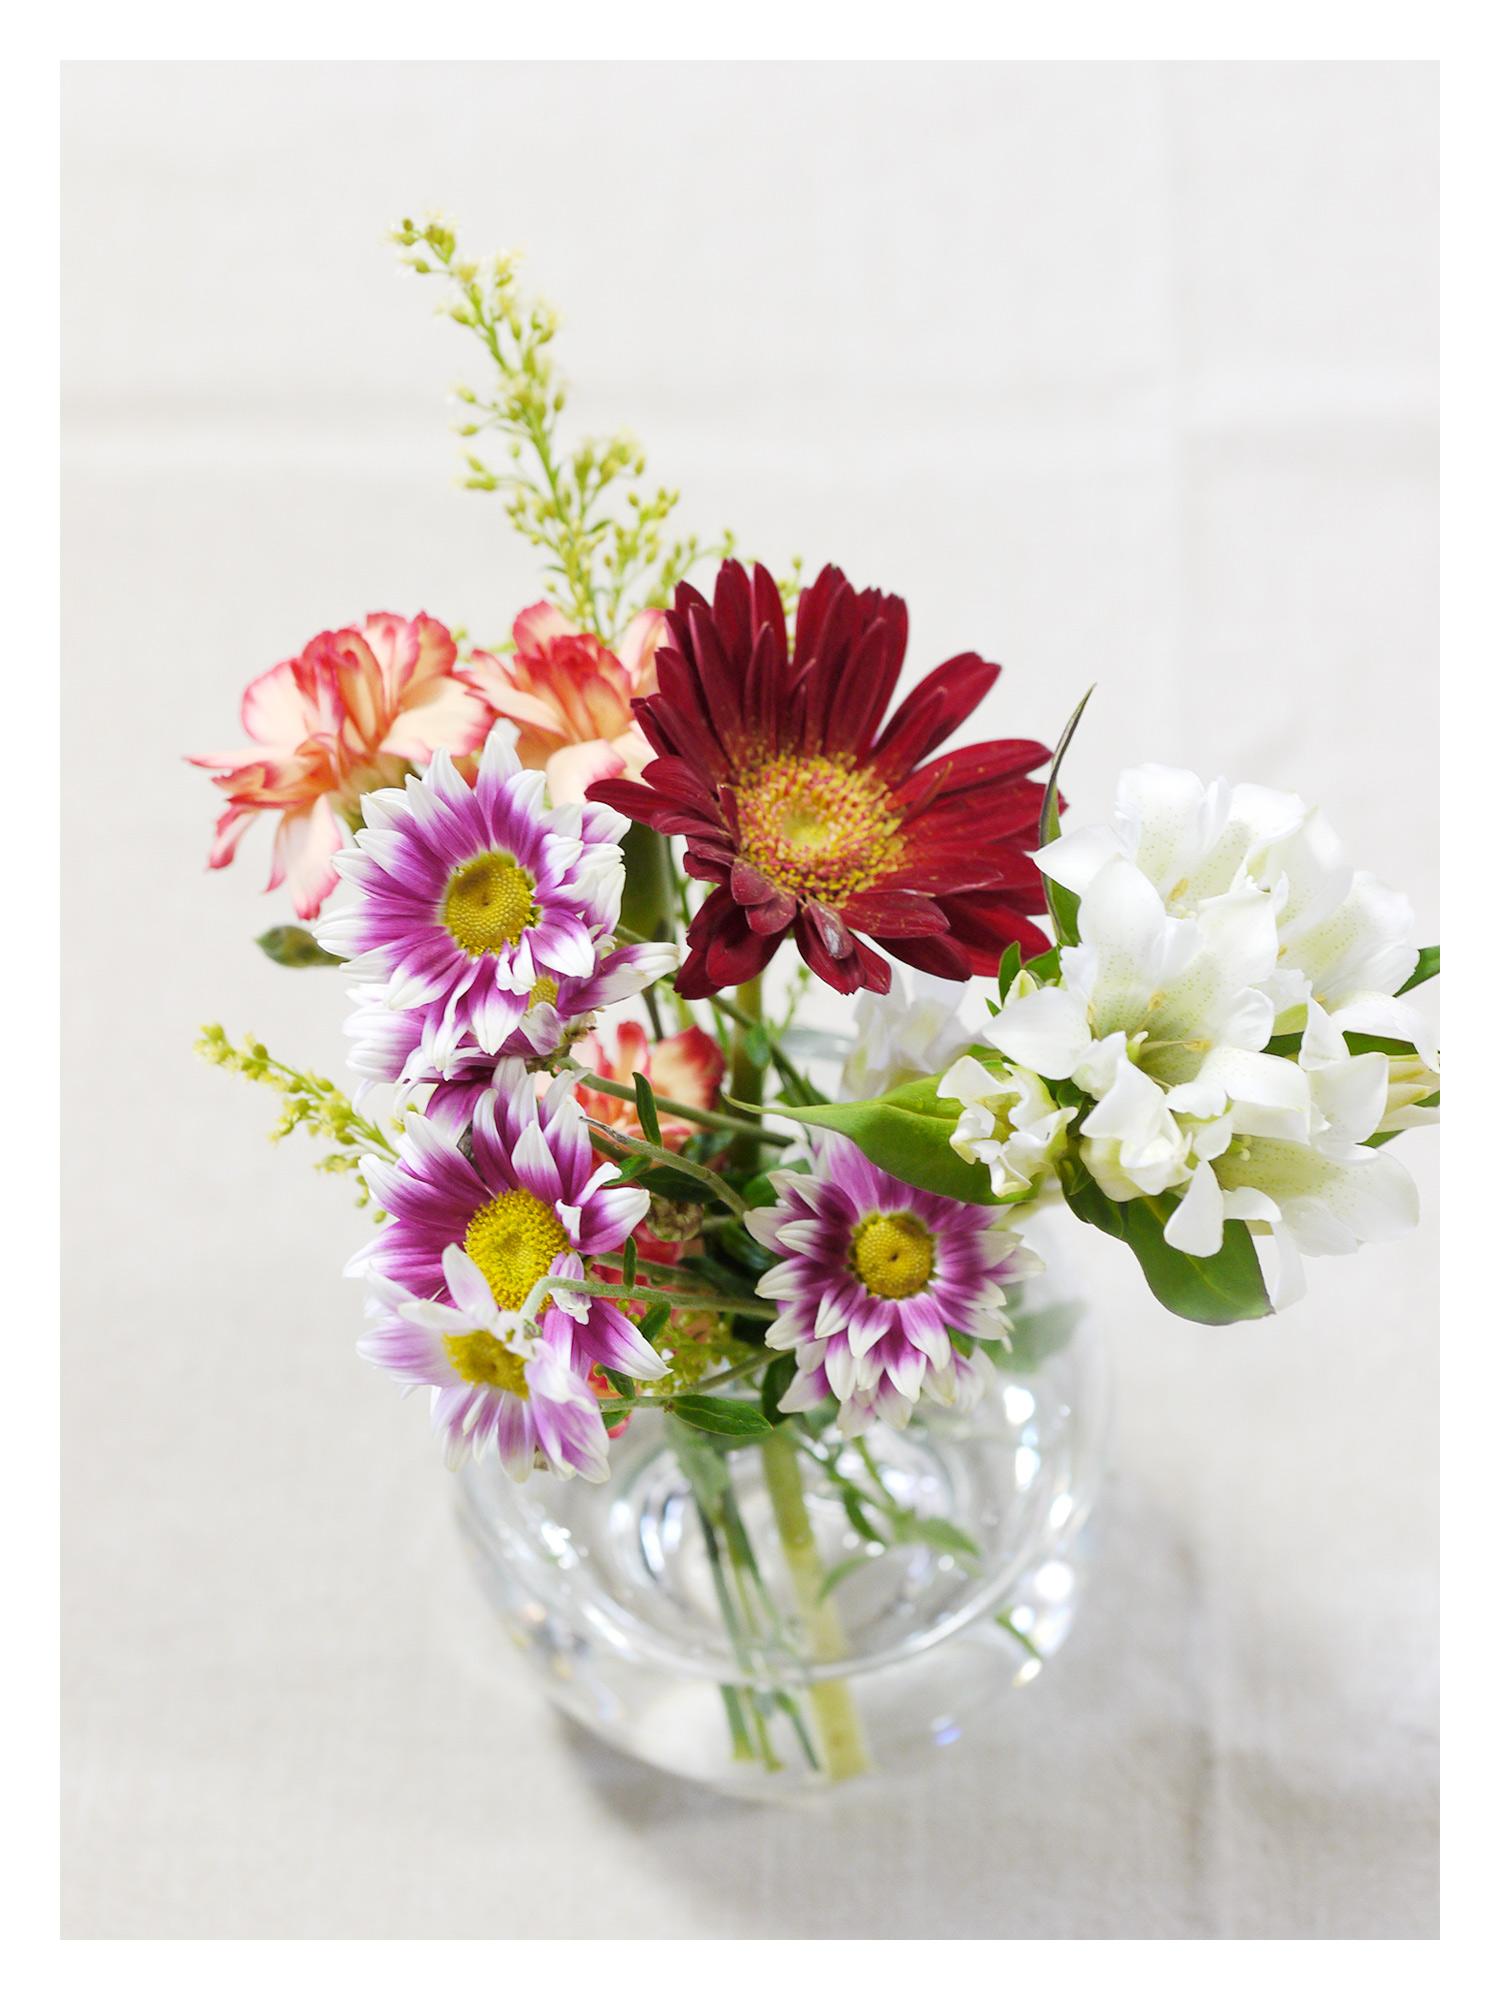 BloomeeLIFE(ブルーミーライフ)800円コース 三週目のお花